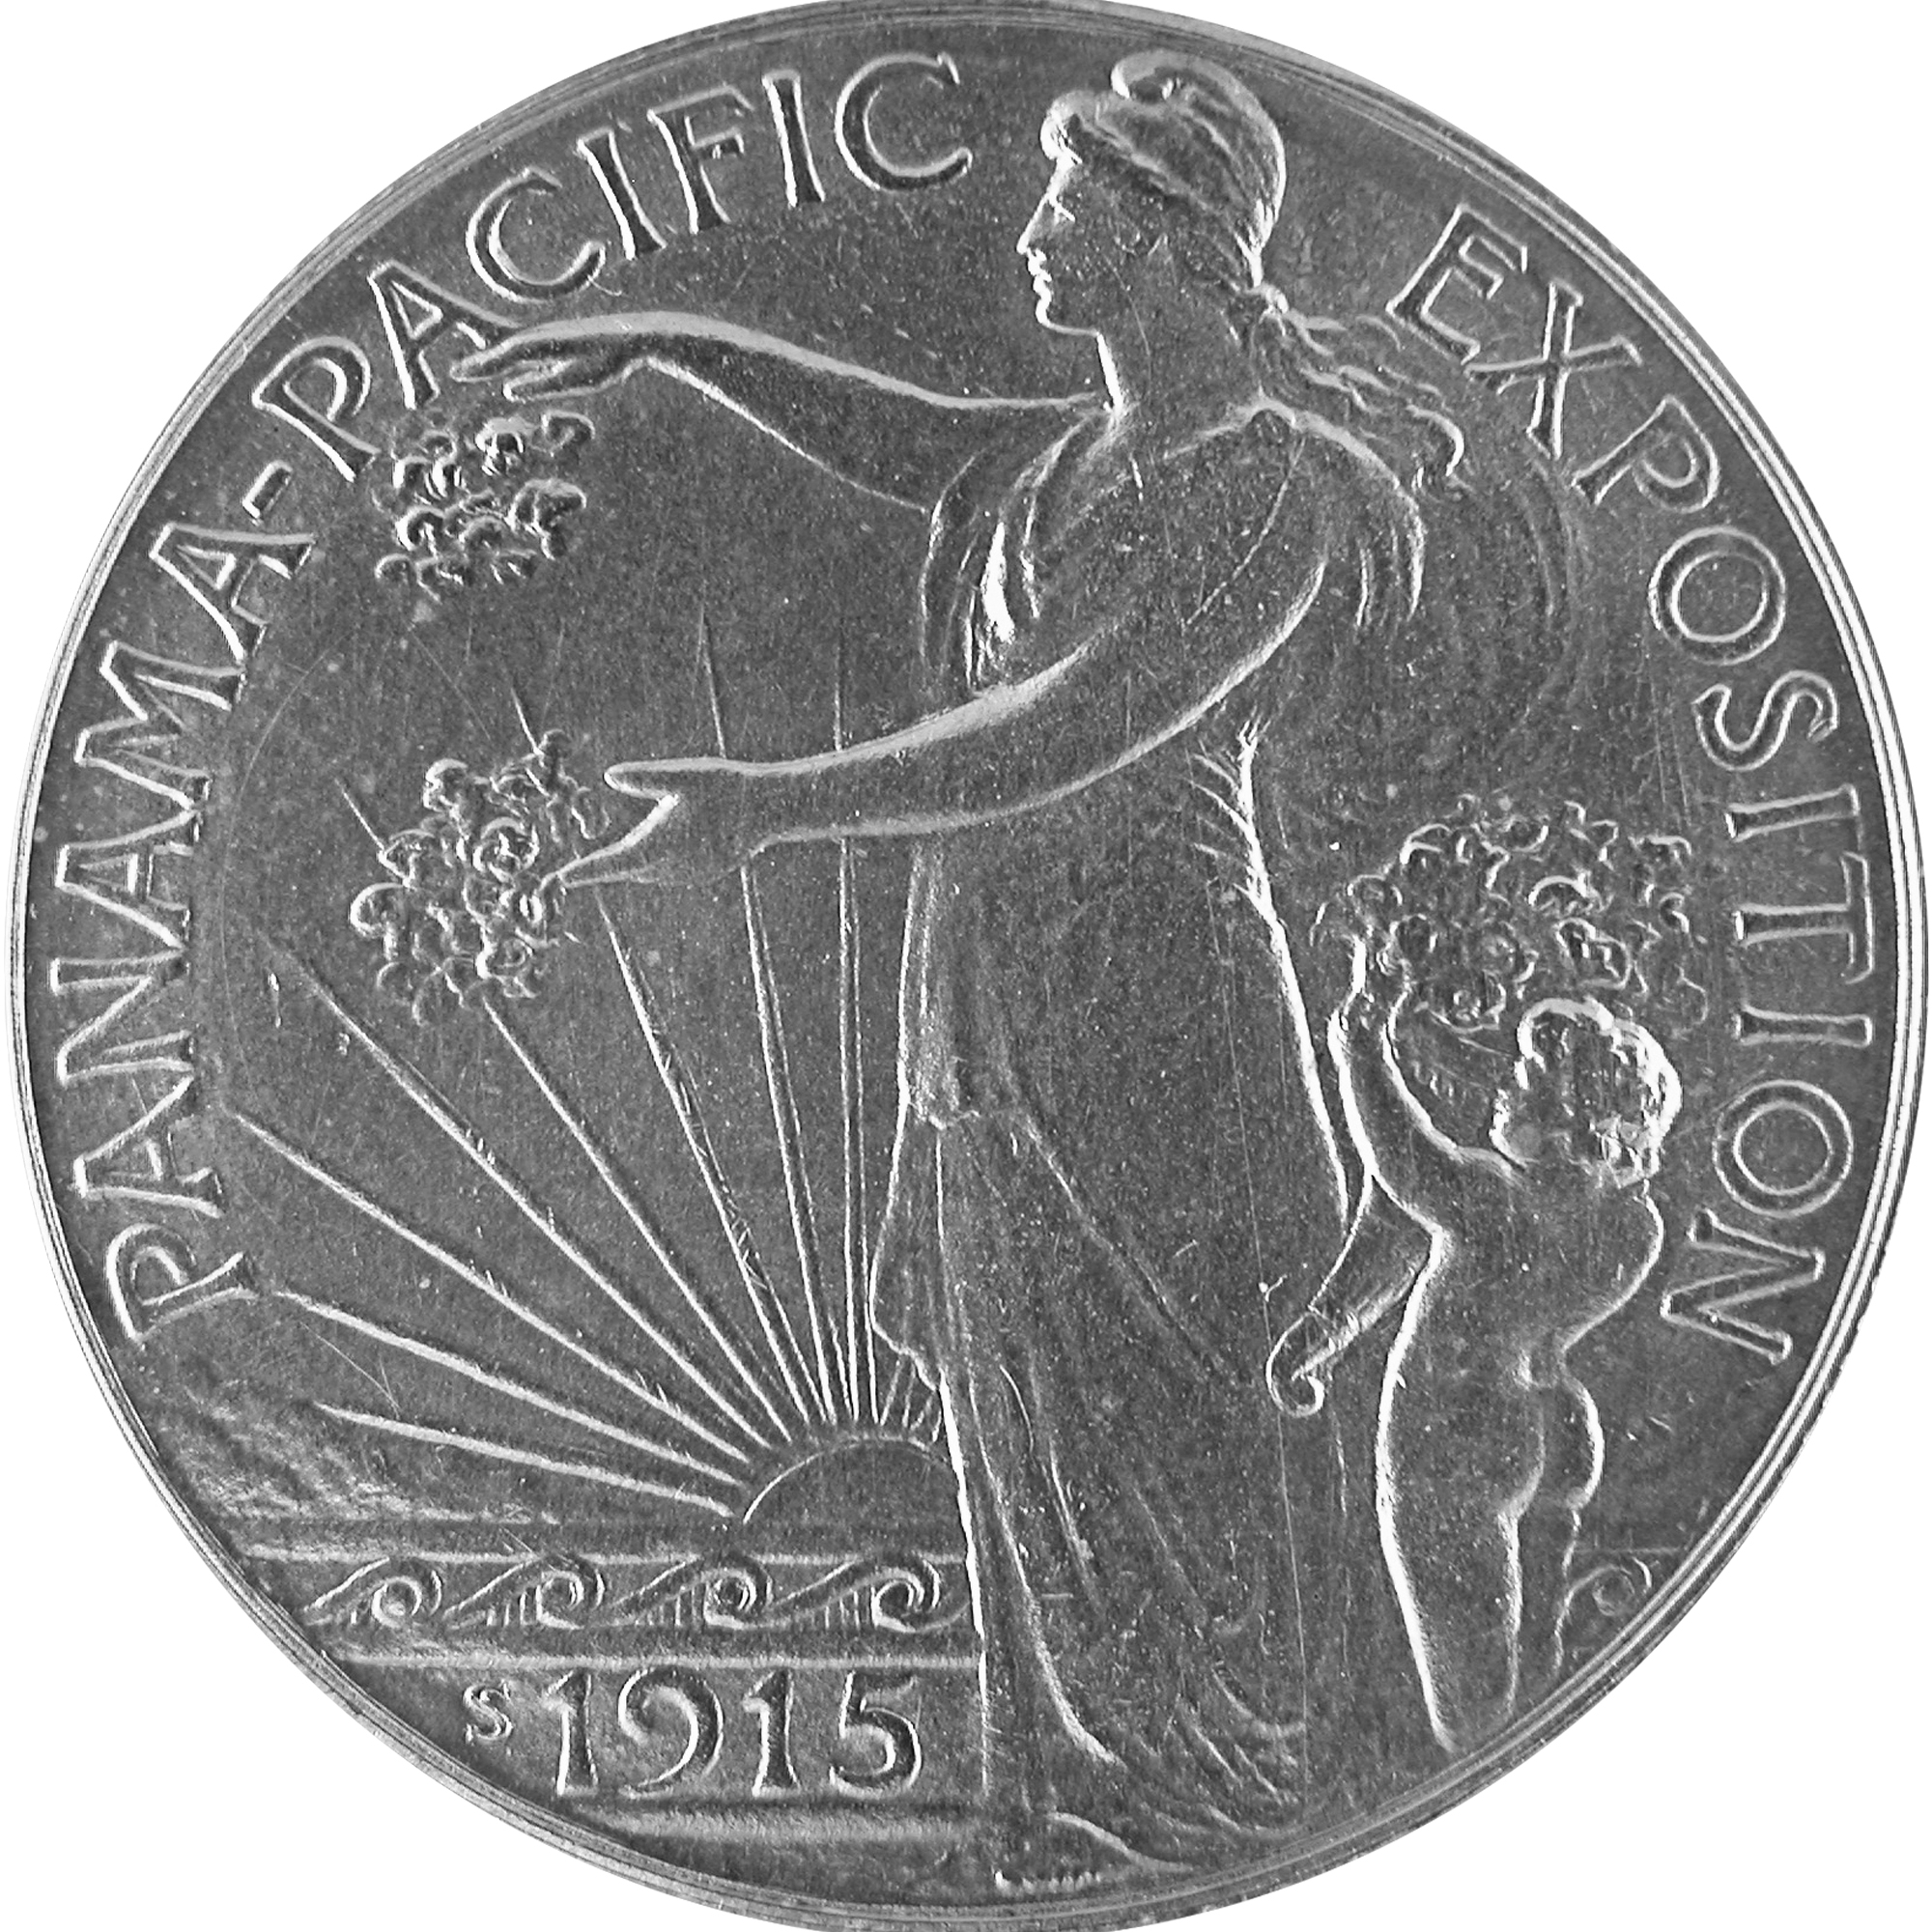 1915 Panama Pacific Exposition Commemorative Silver Half Dollar Coin Obverse